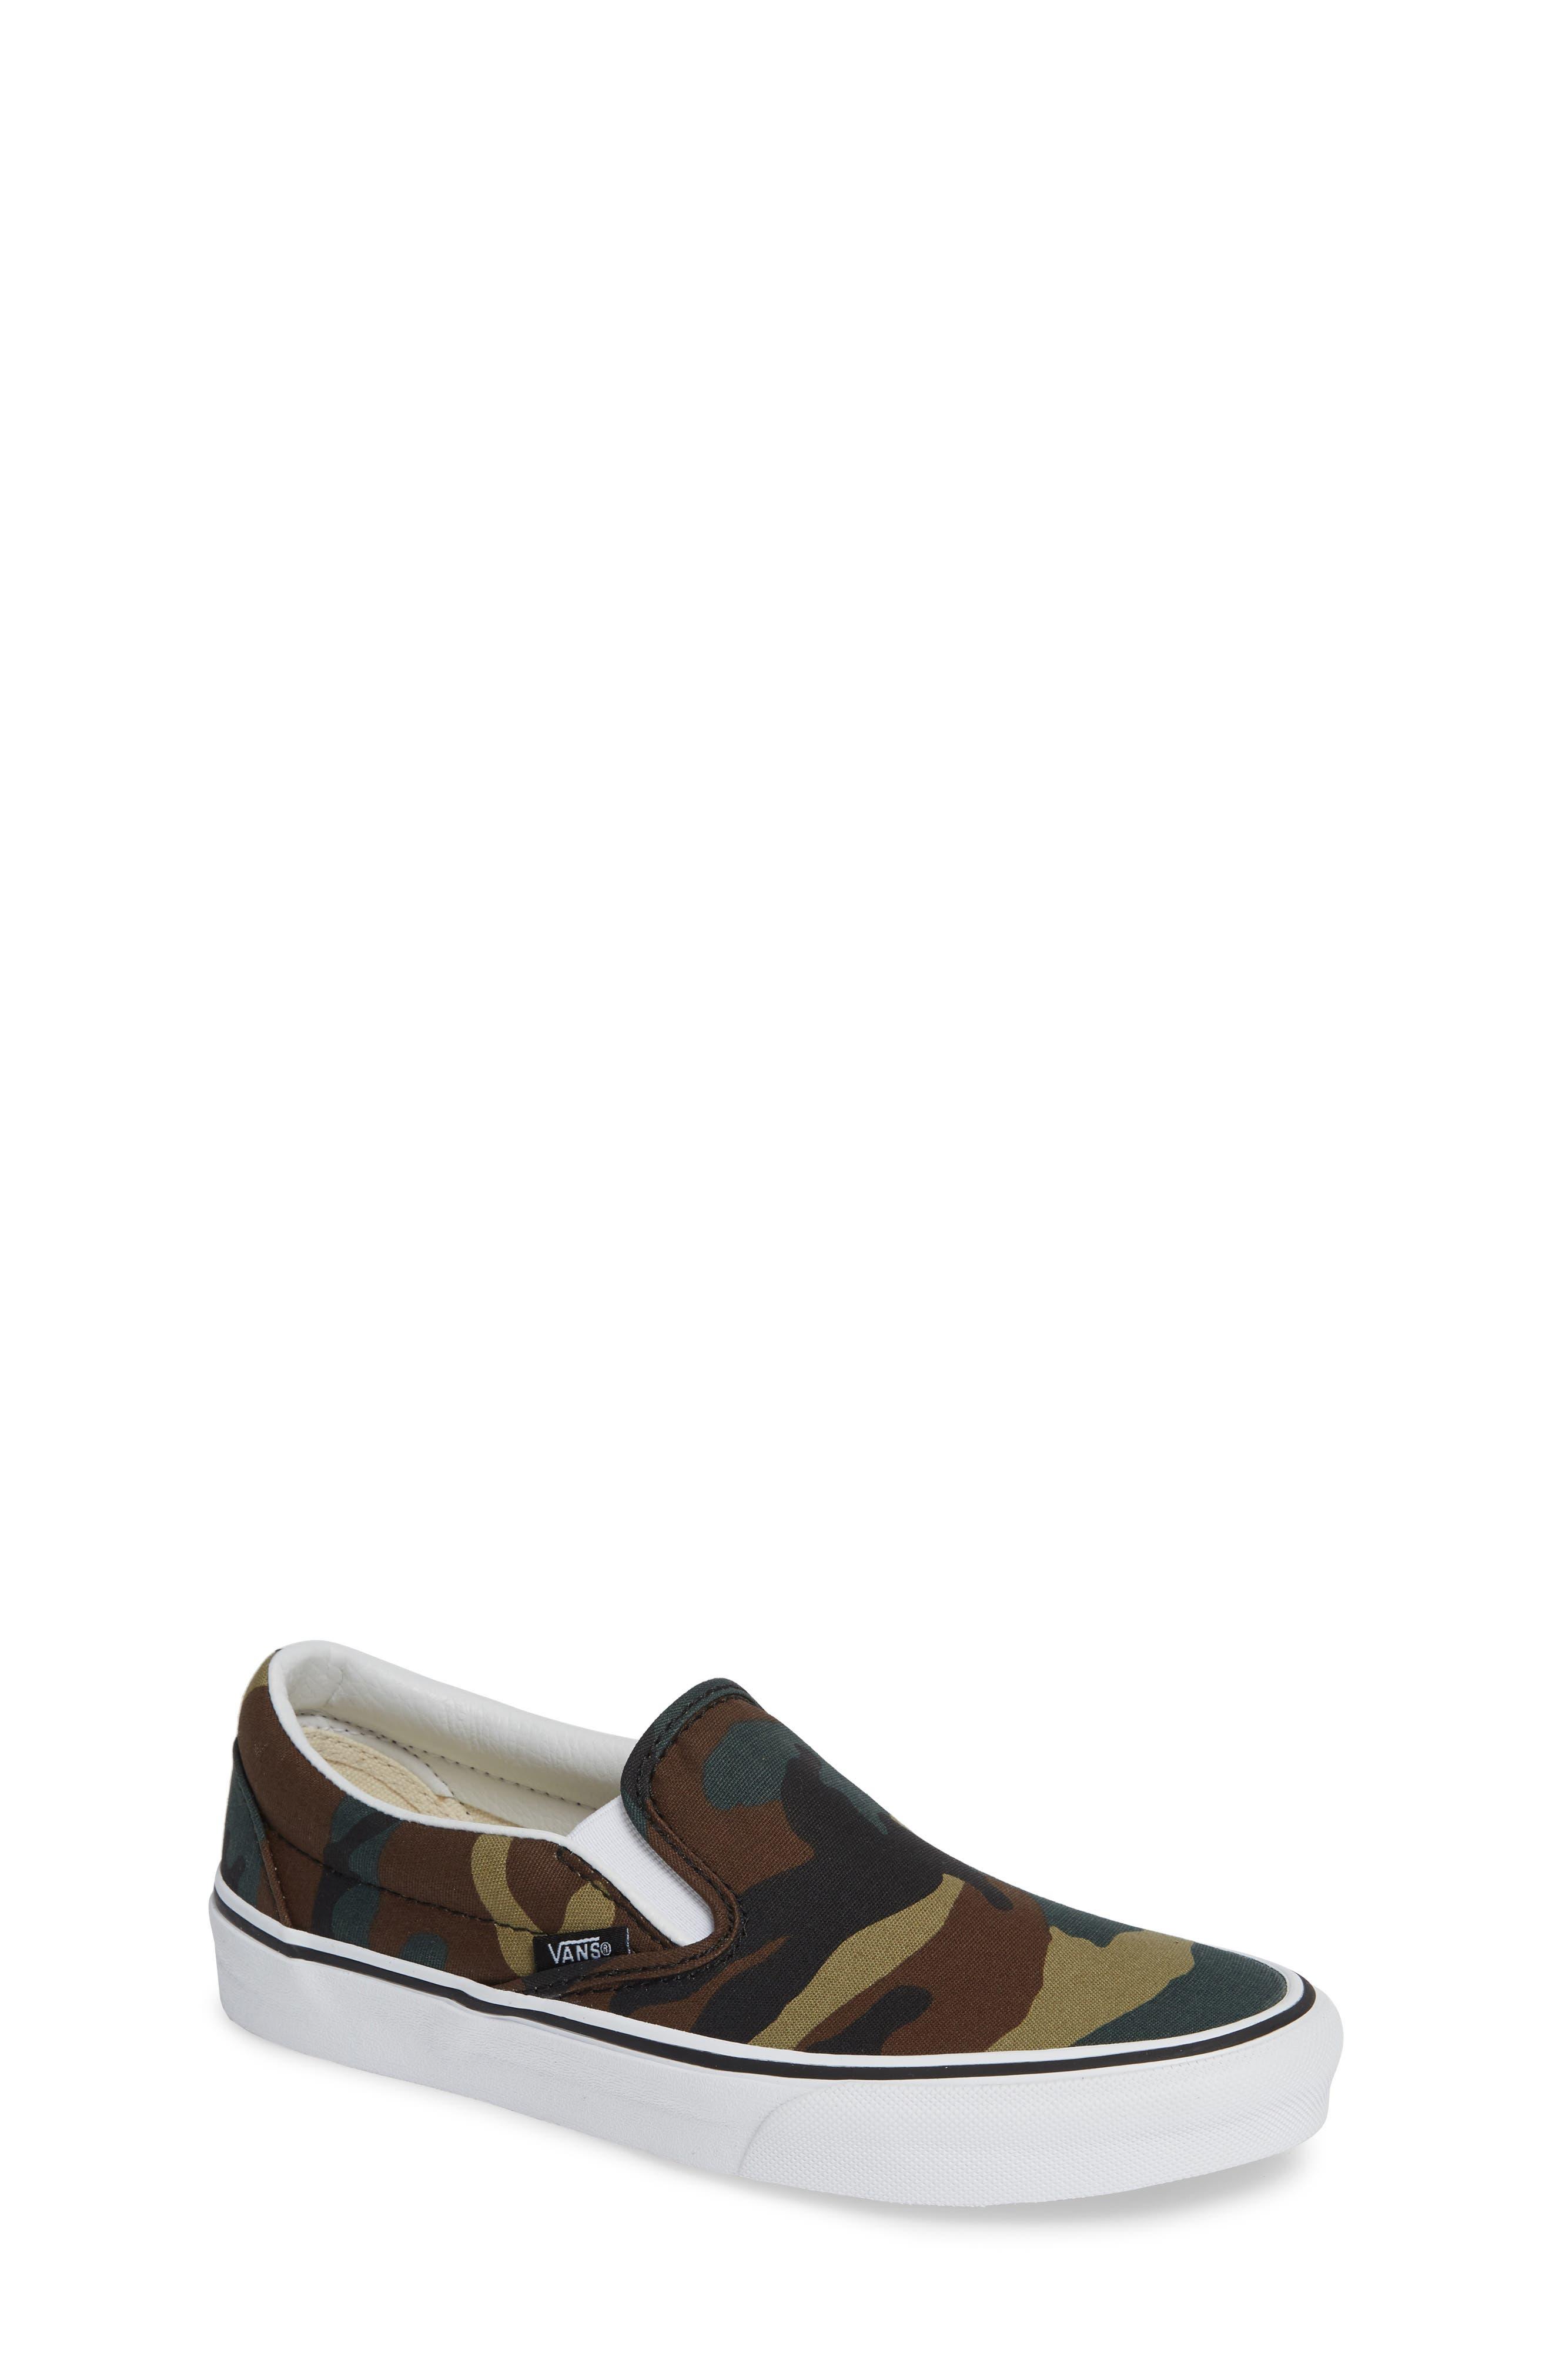 Classic Slip-On Sneaker,                         Main,                         color, Black / Woodland